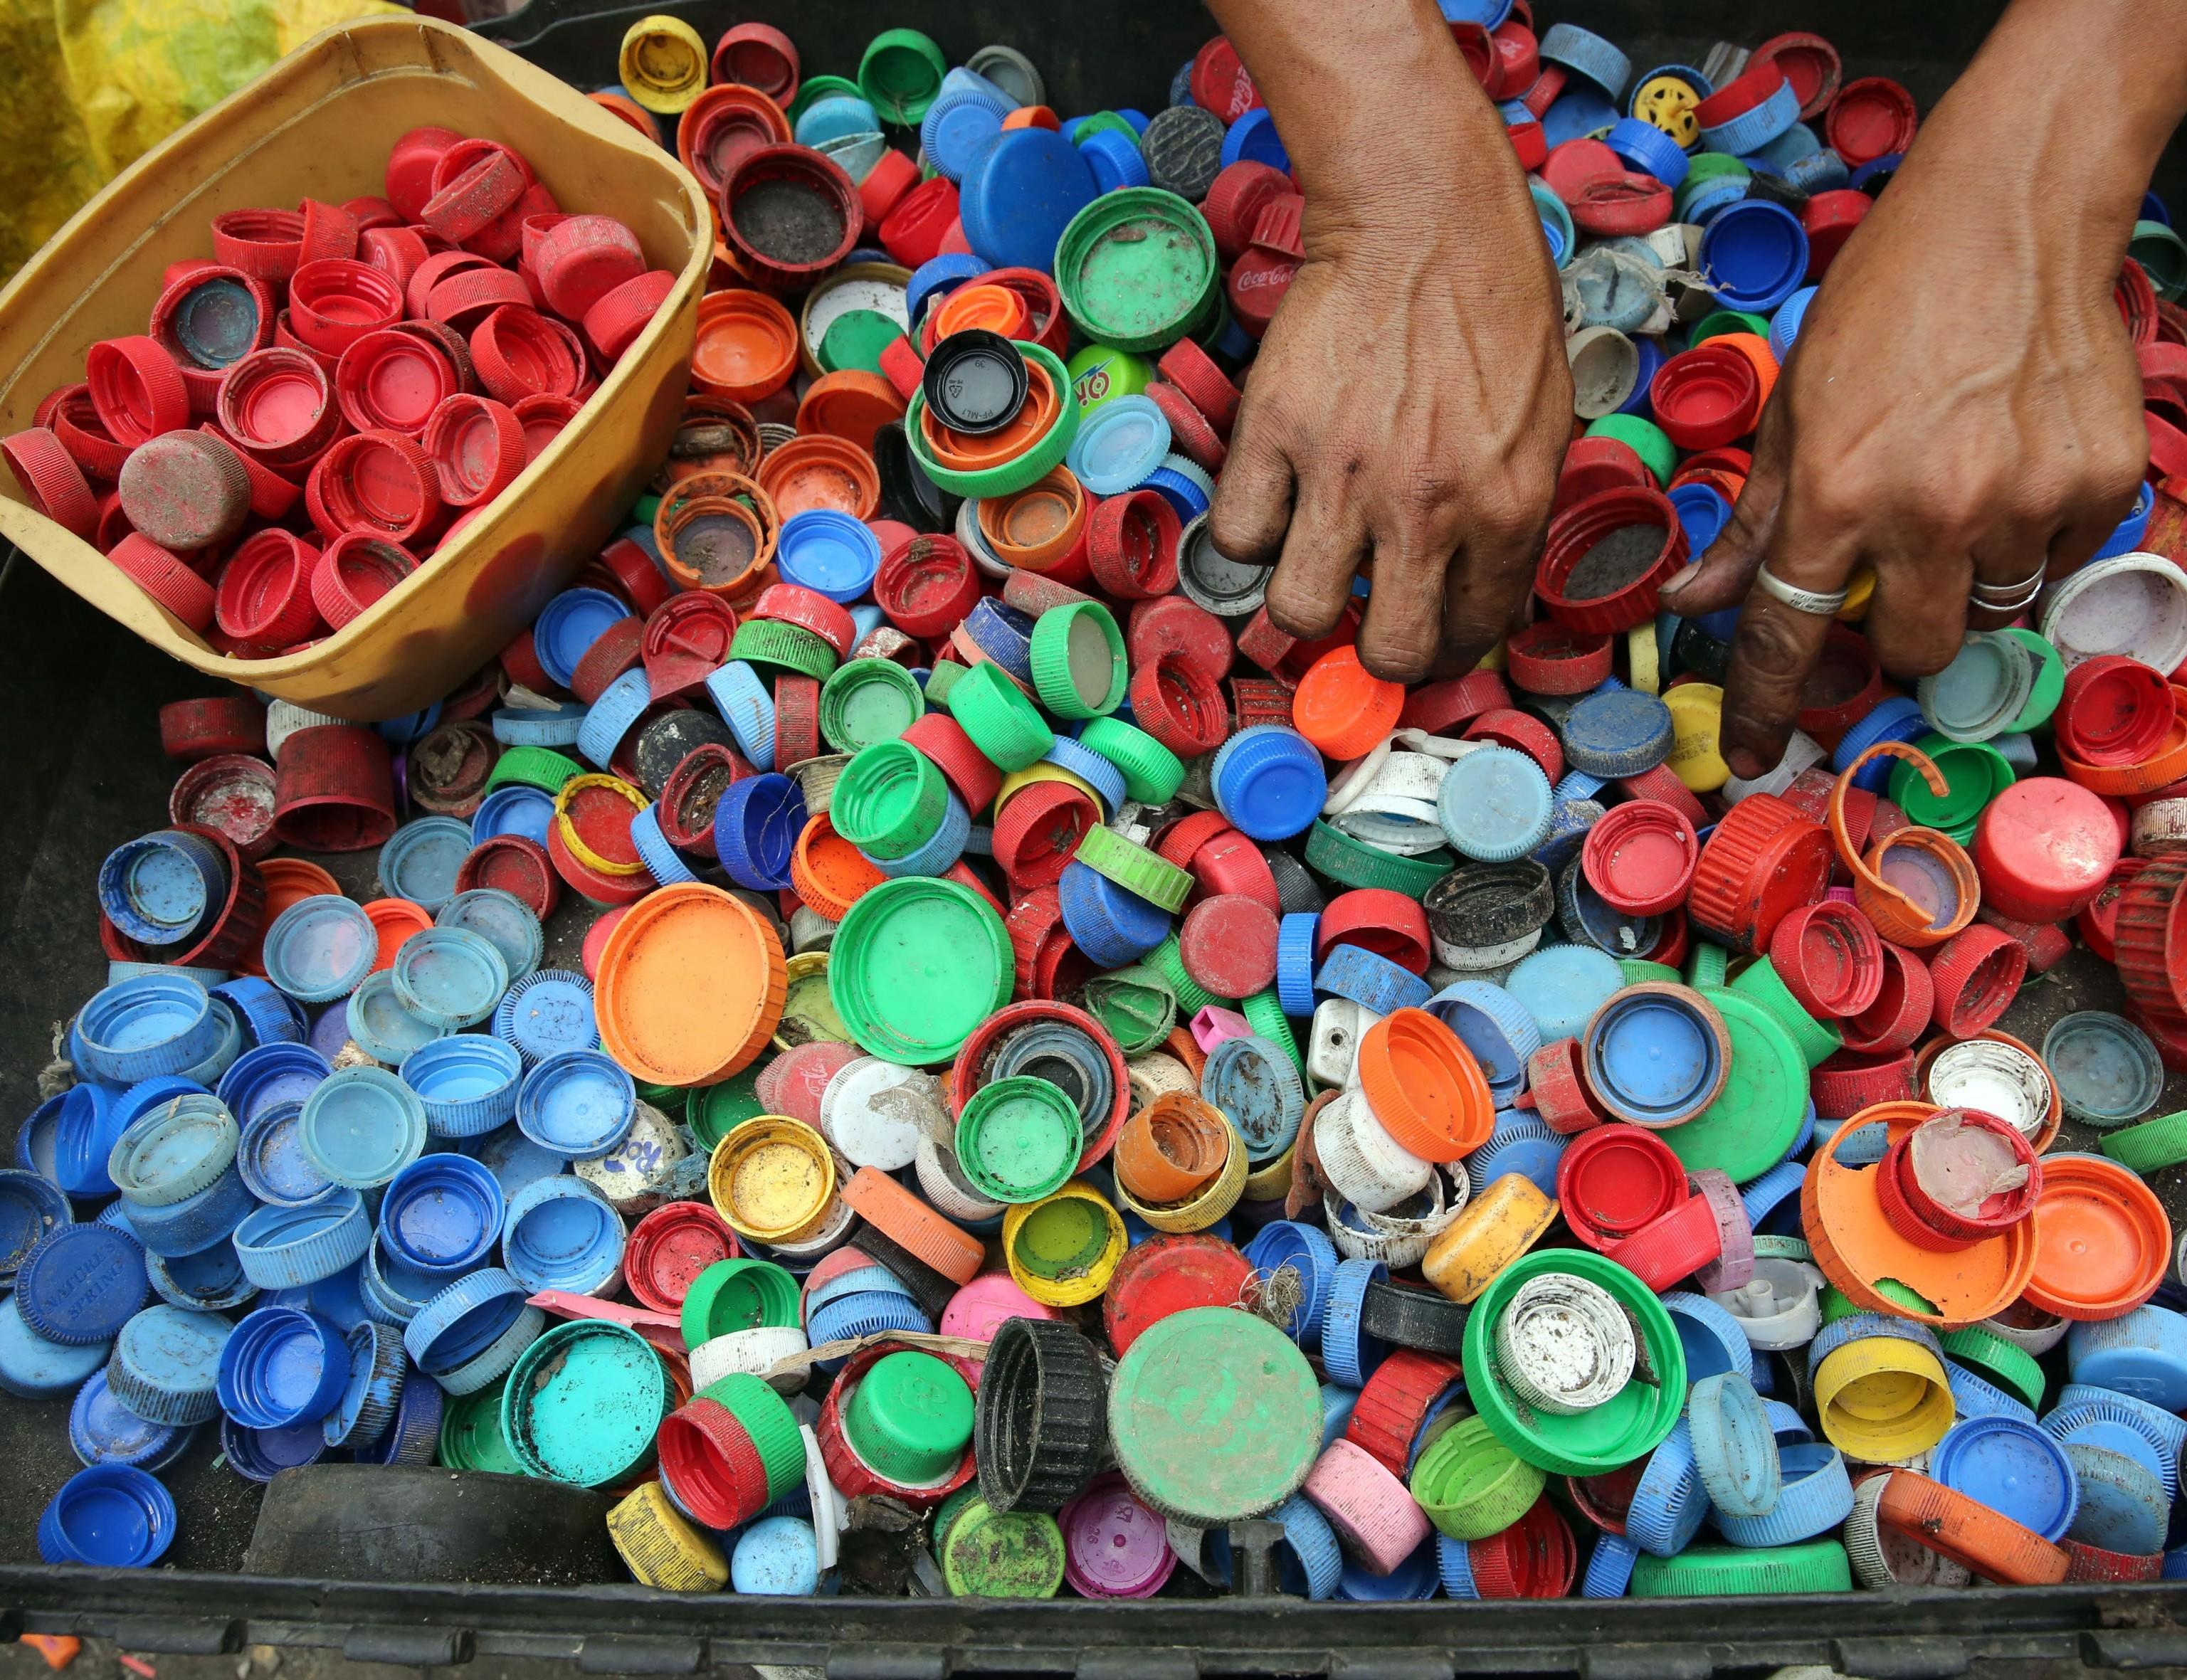 Plastics Usage and Reusage